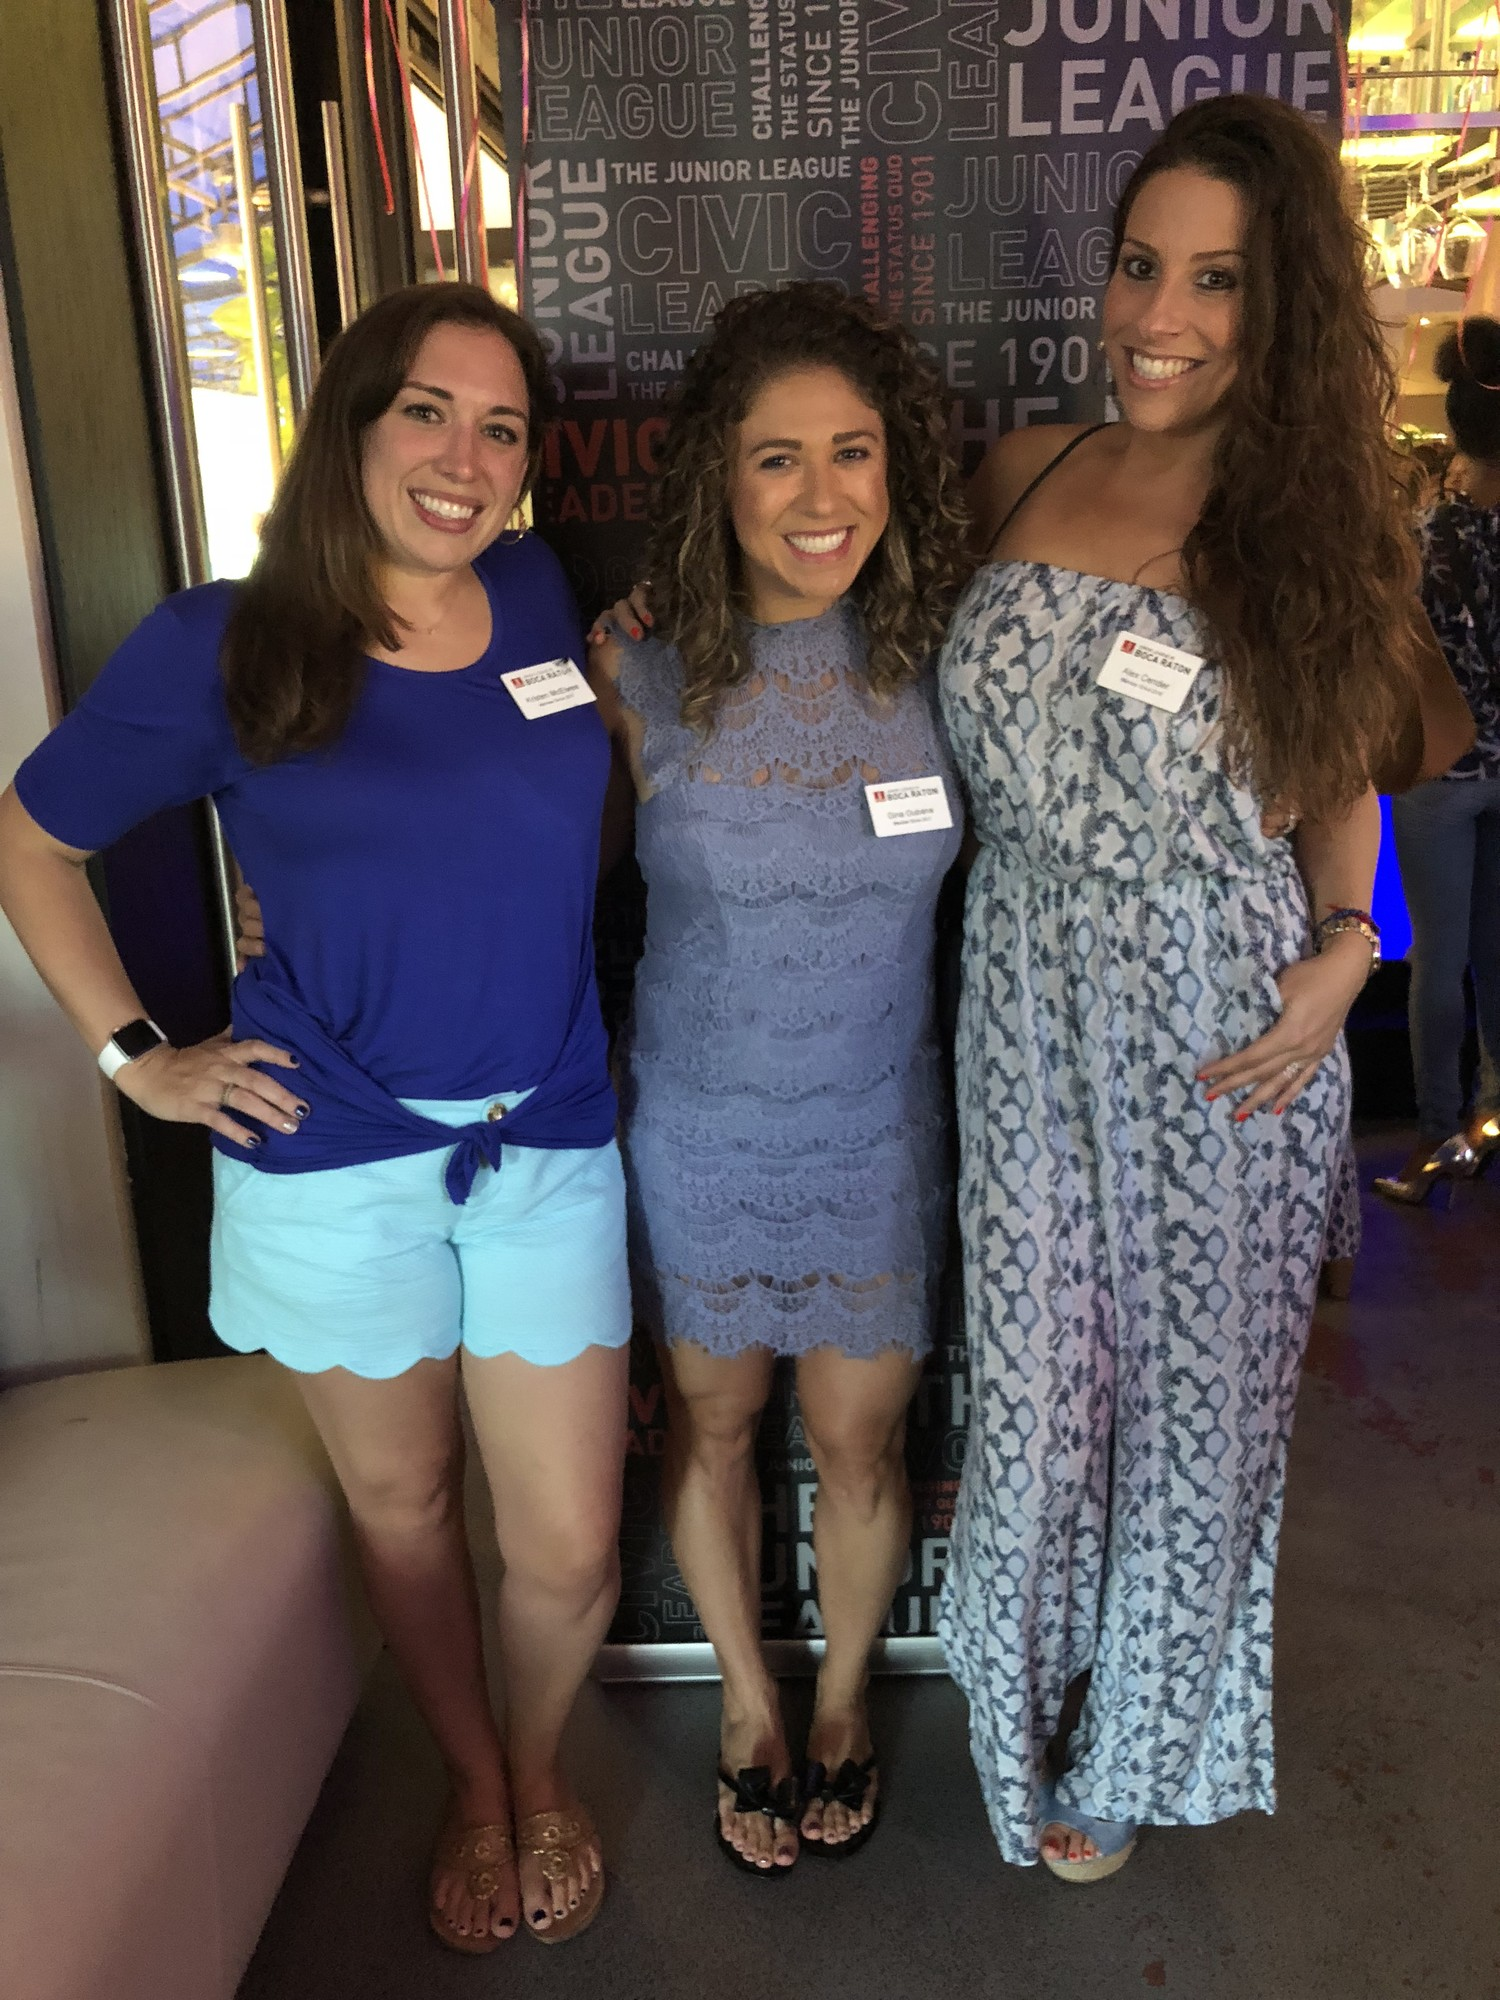 Boca raton women